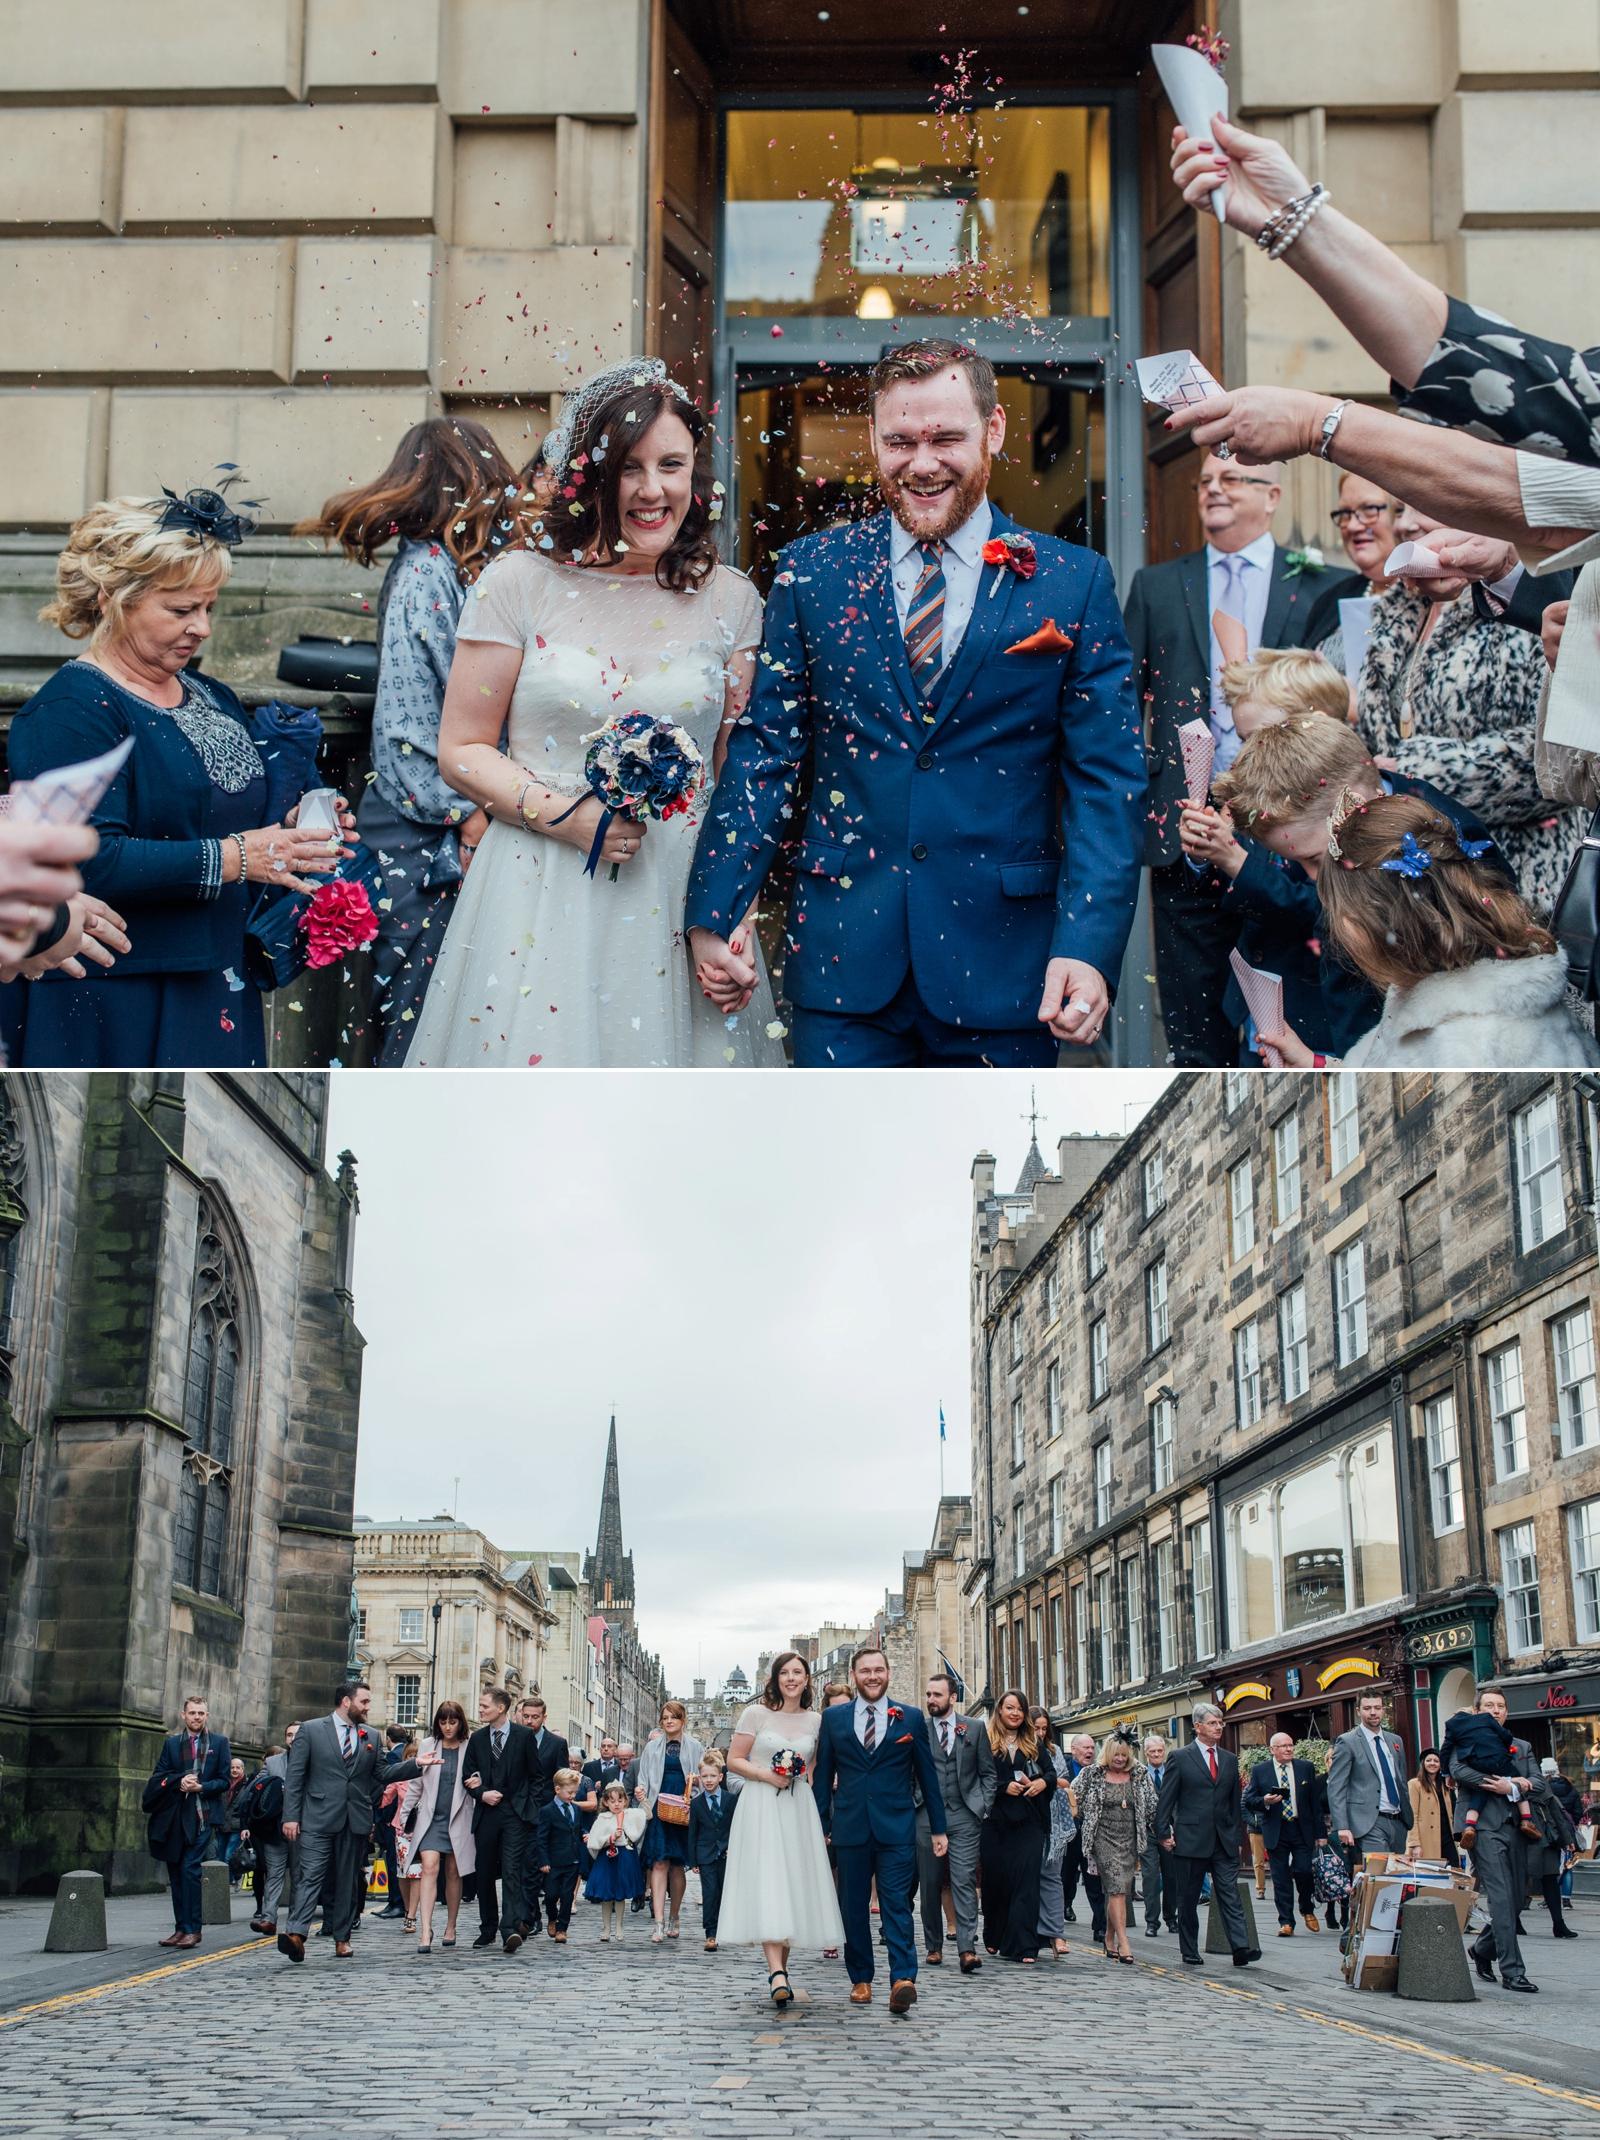 thecaves_retro_DIY_wedding_00055.jpg